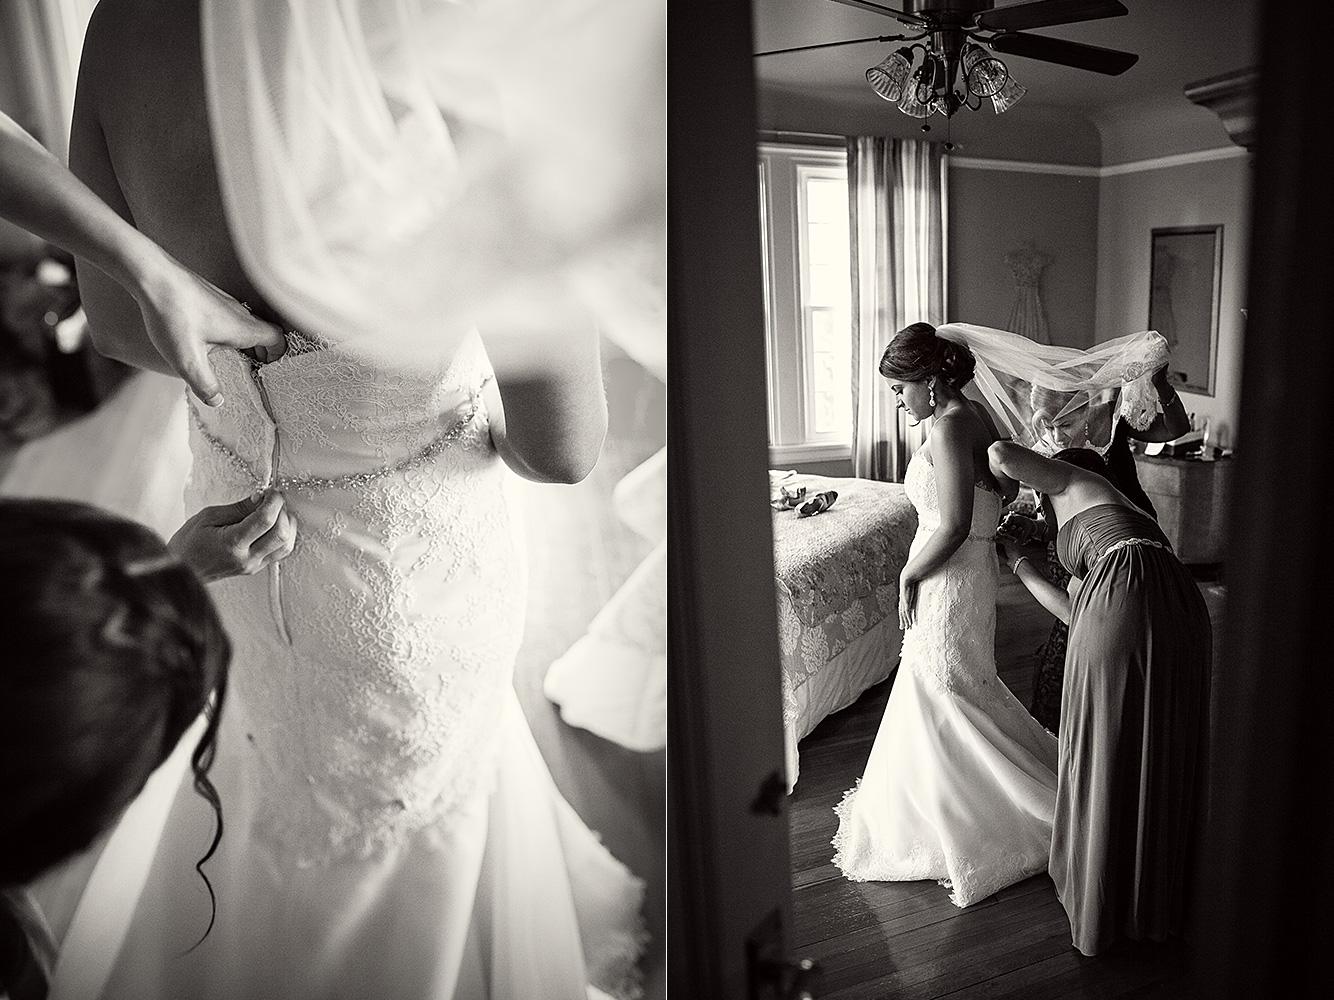 NY_Wedding_Photographer_AsEr_11.jpg